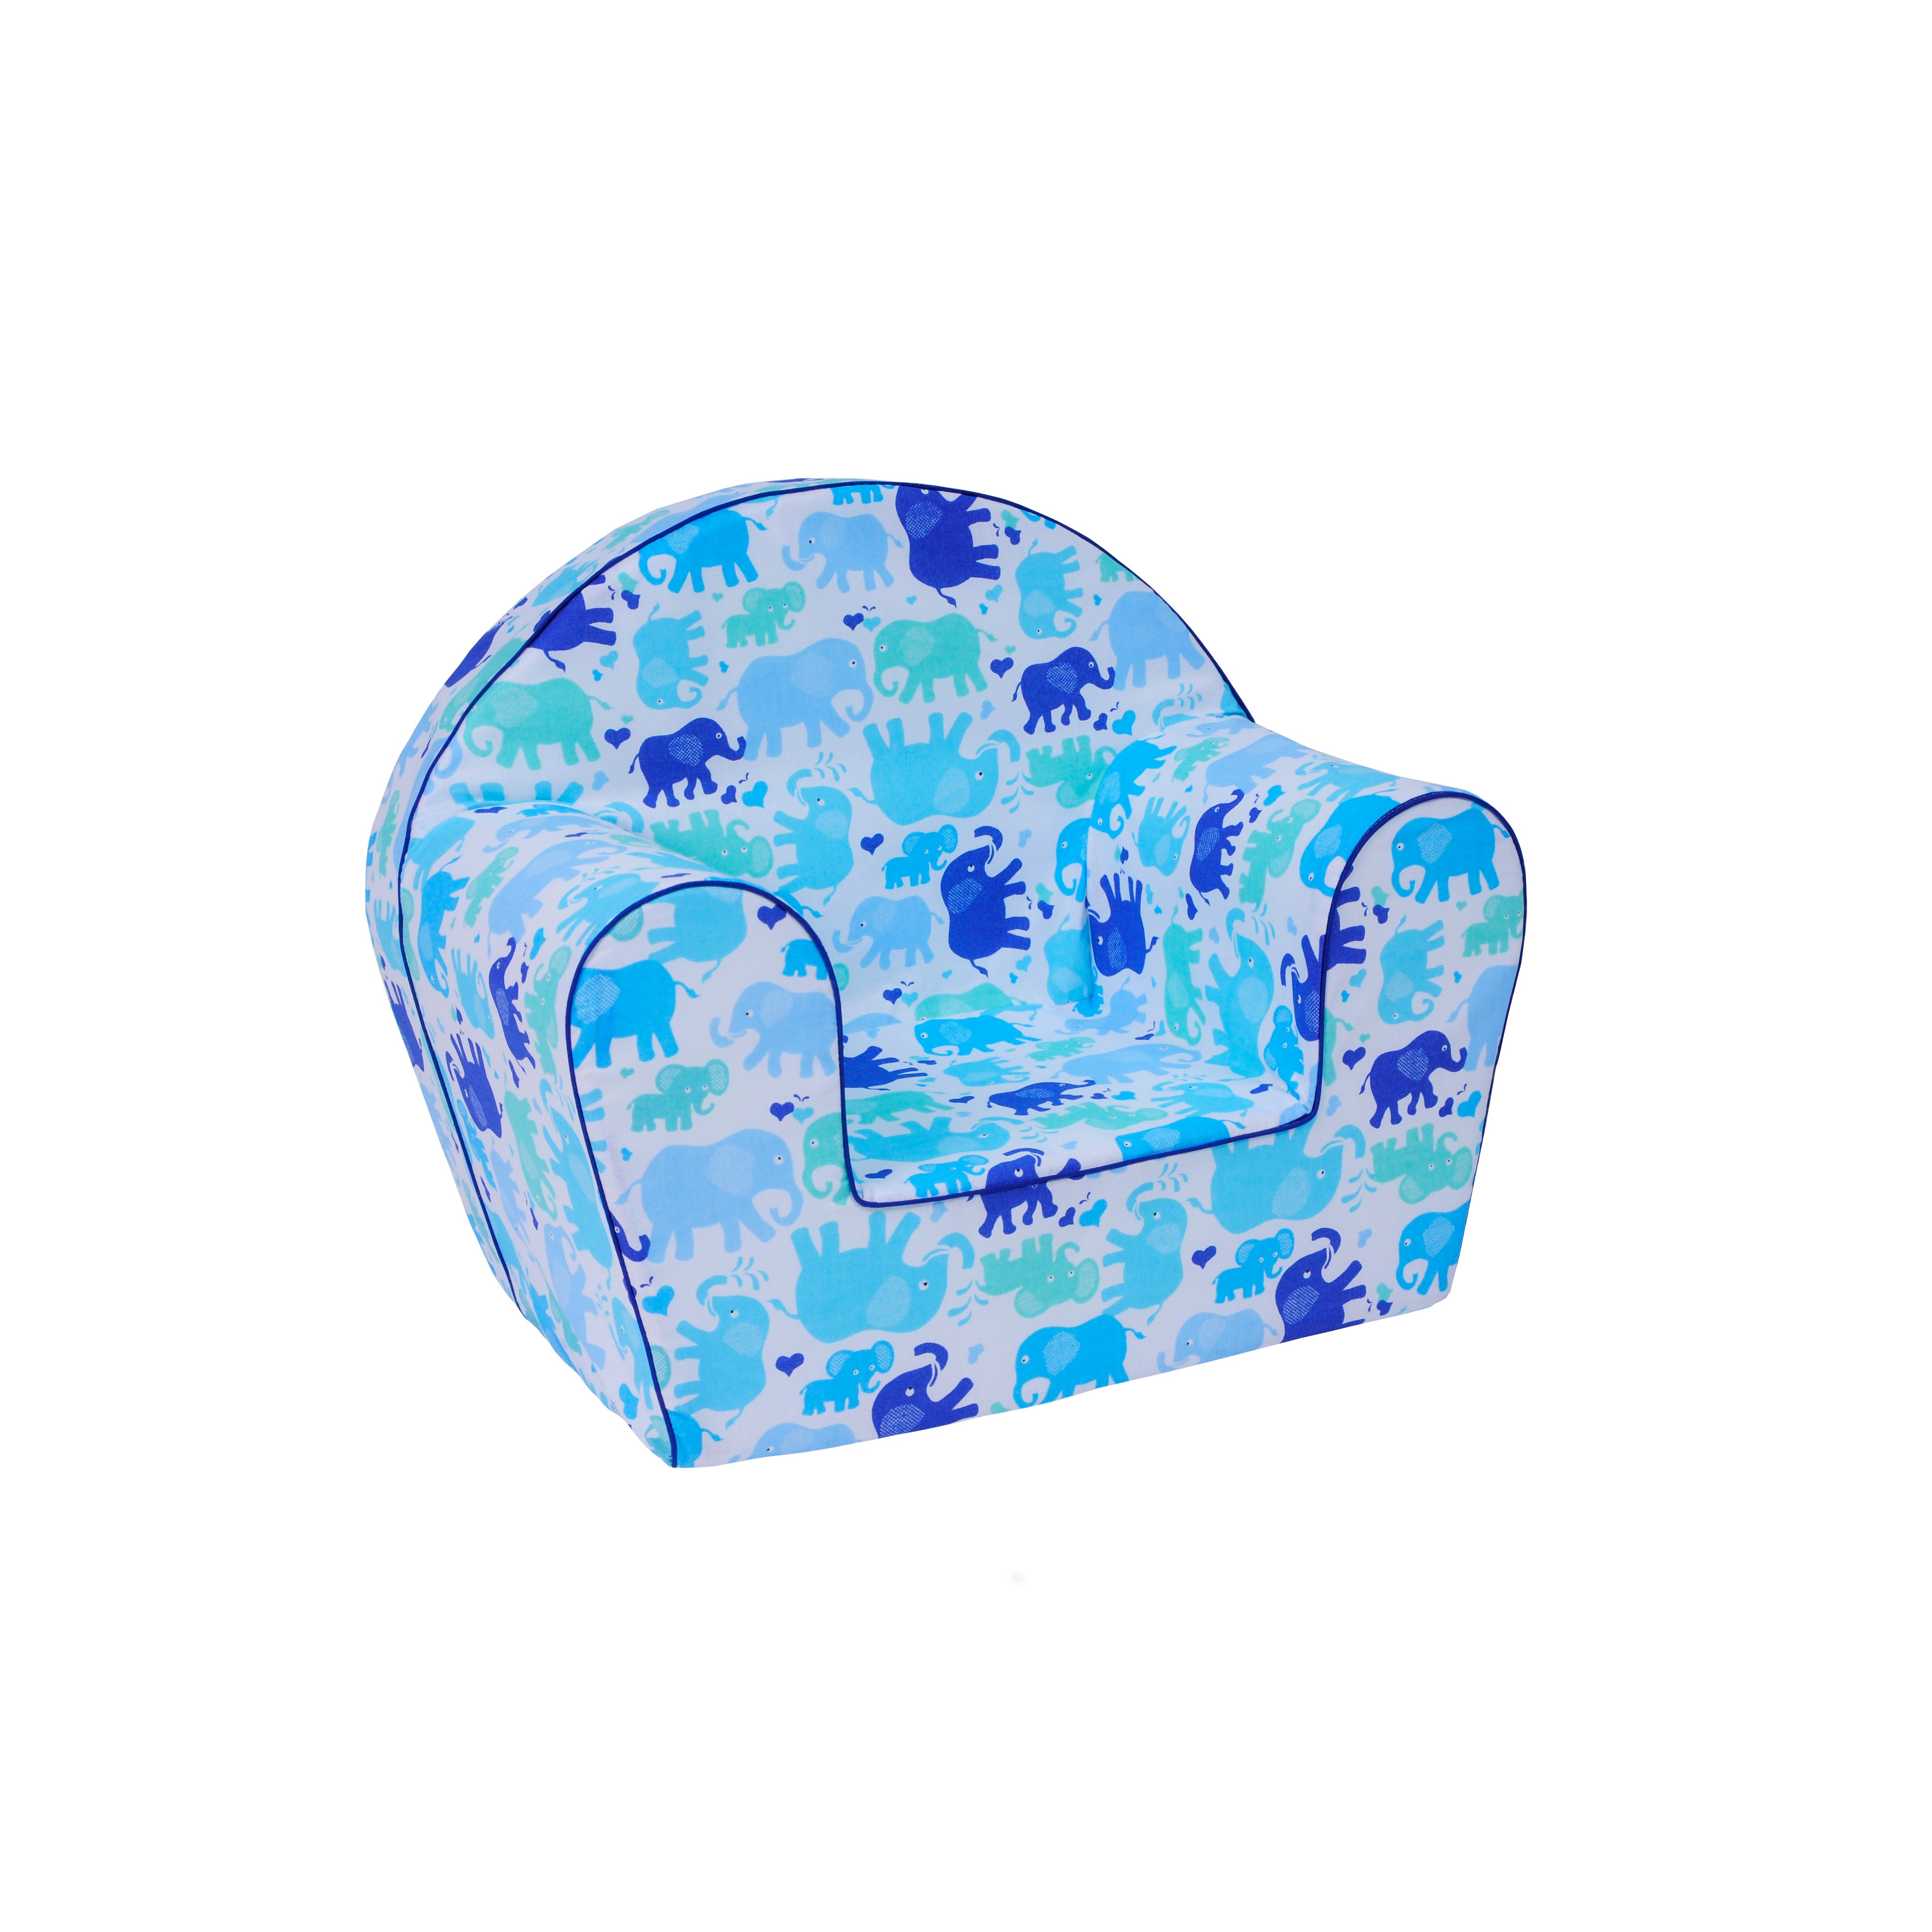 5a906f7f8a0f Detské kresielko MINI - SLONI modré ...